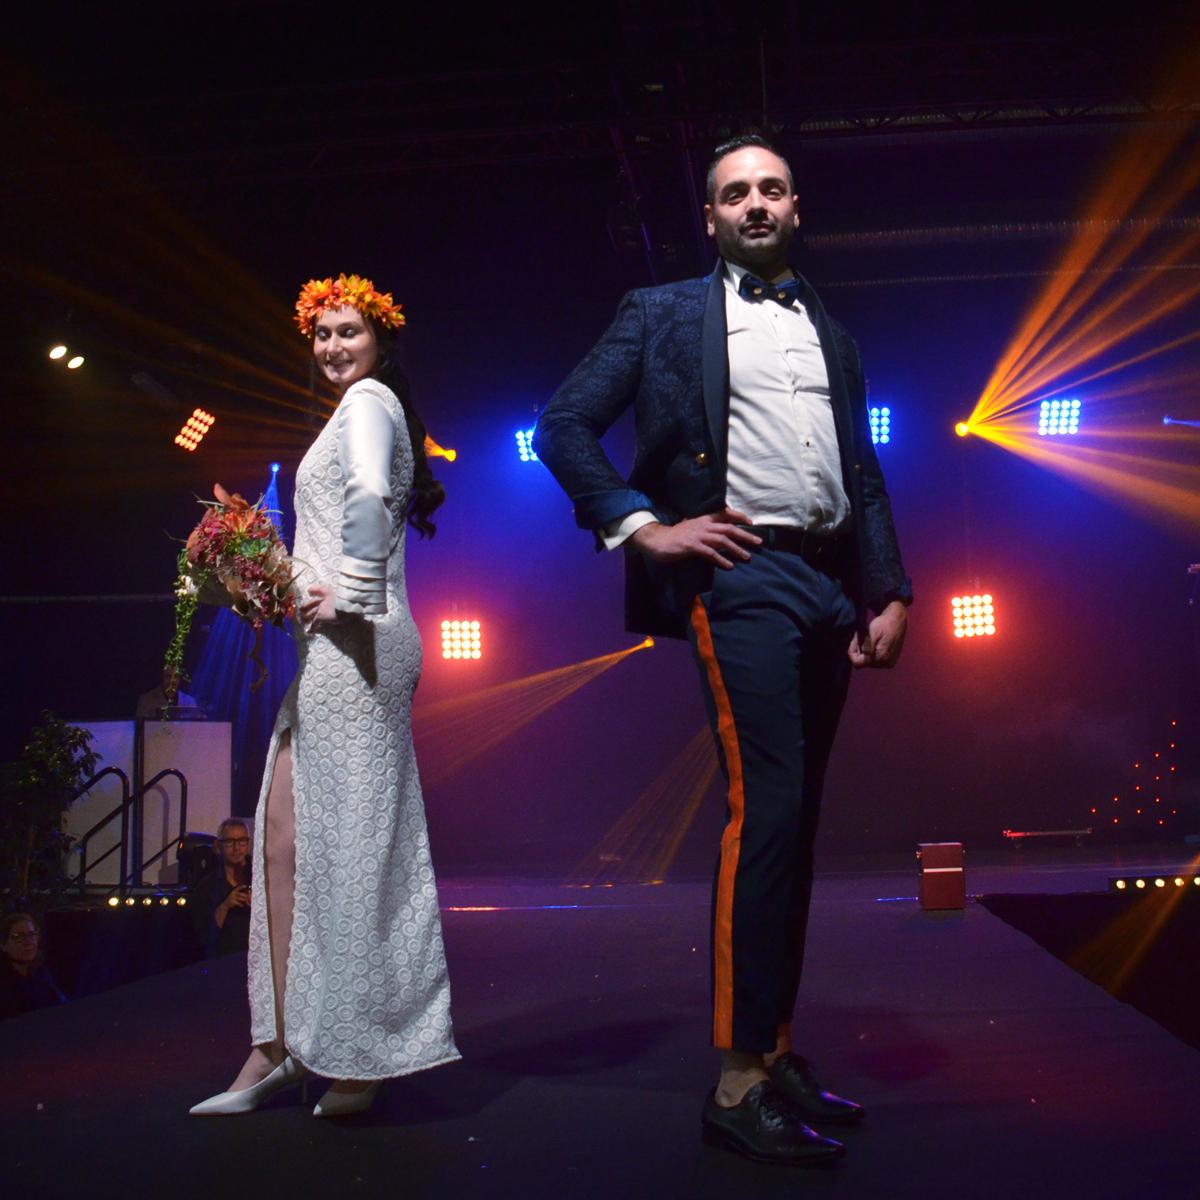 Salon du Mariage d'Athis-Mons 2019 - Collection Mariées 2020 - photo @Marveloos Photos